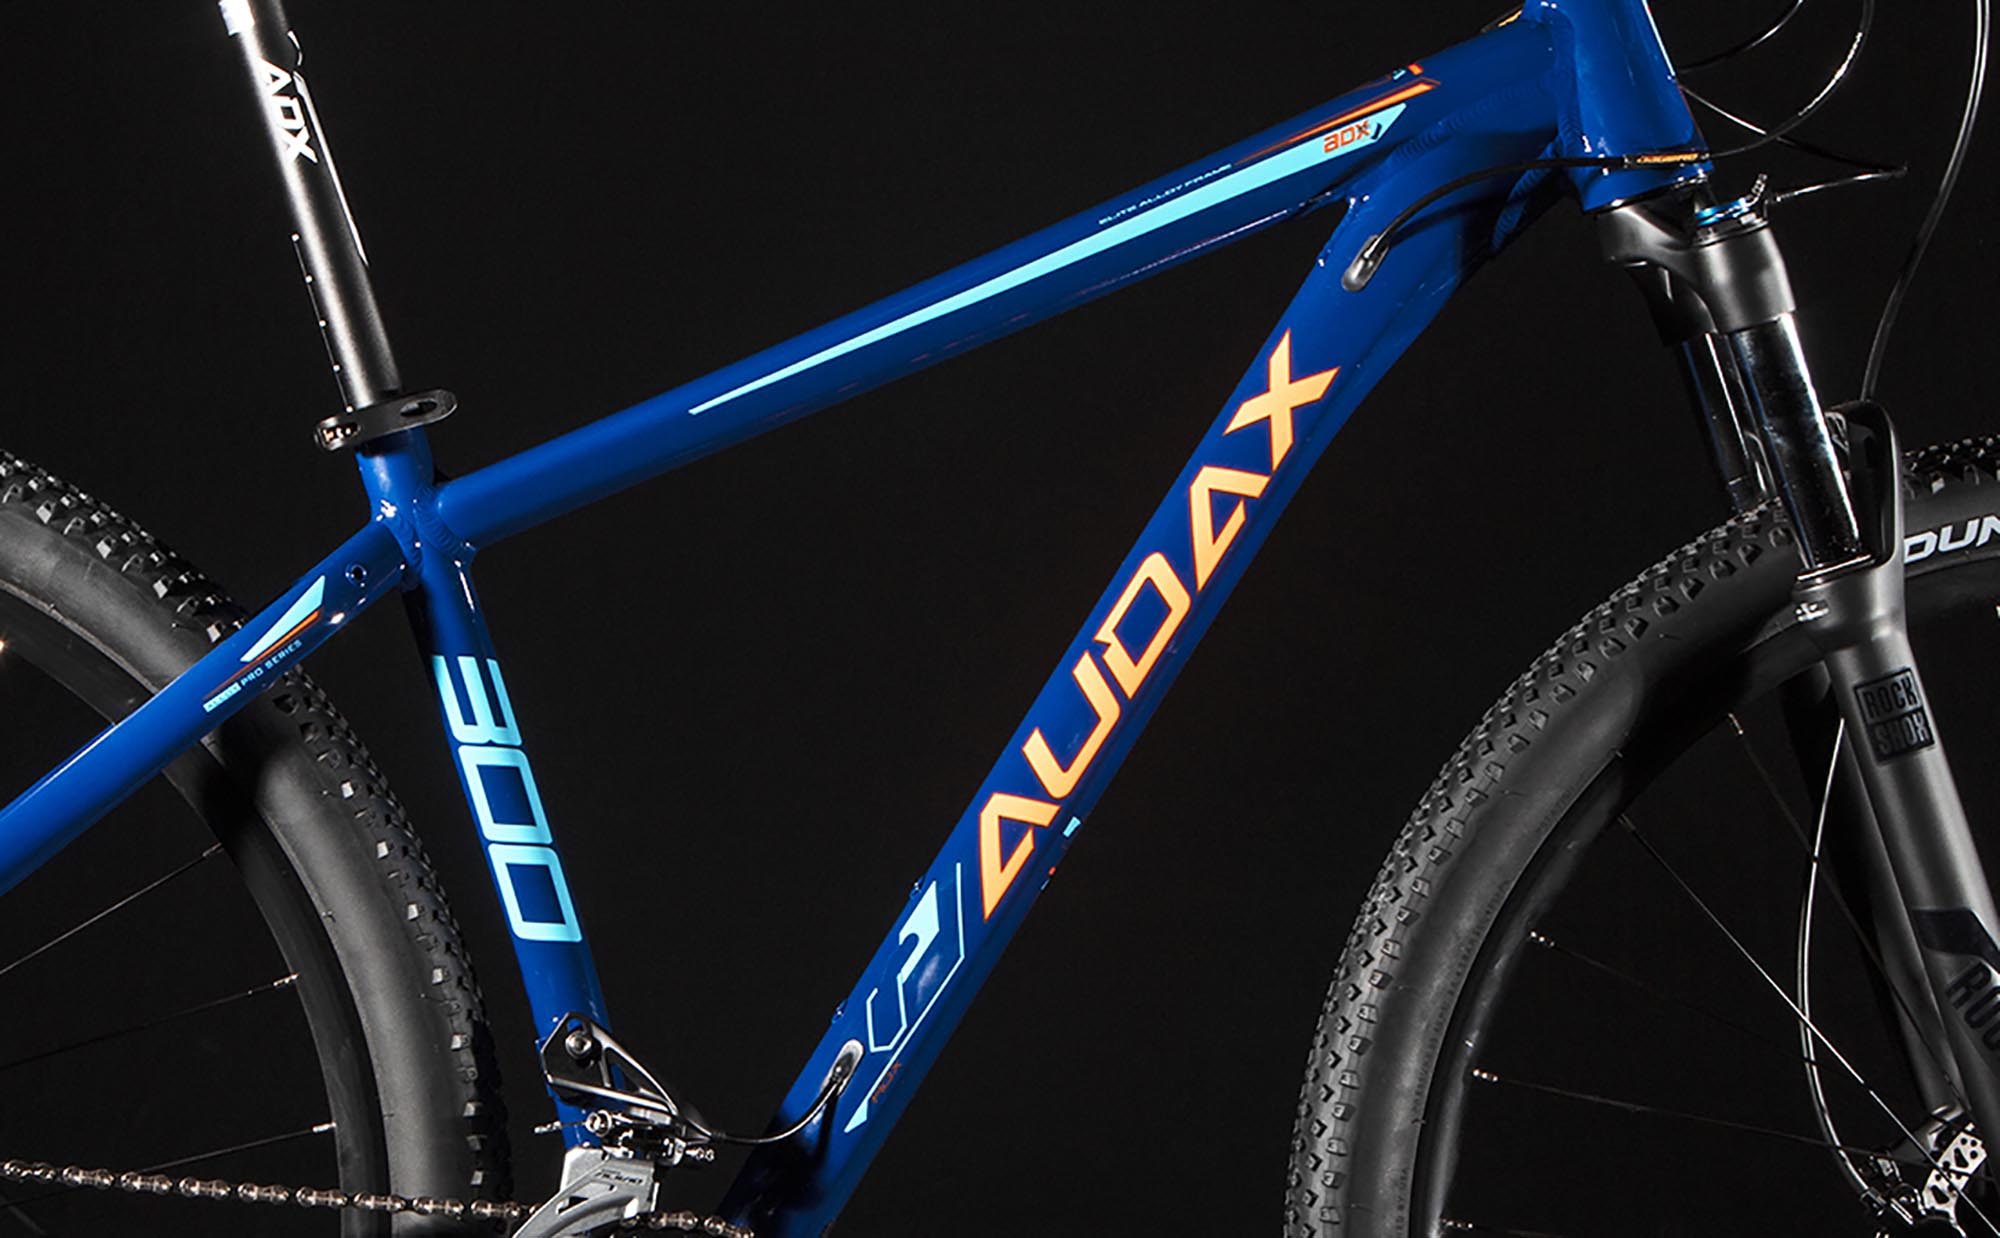 Bicicleta 29 ADX 300 Azul Kit Alivio- Audax